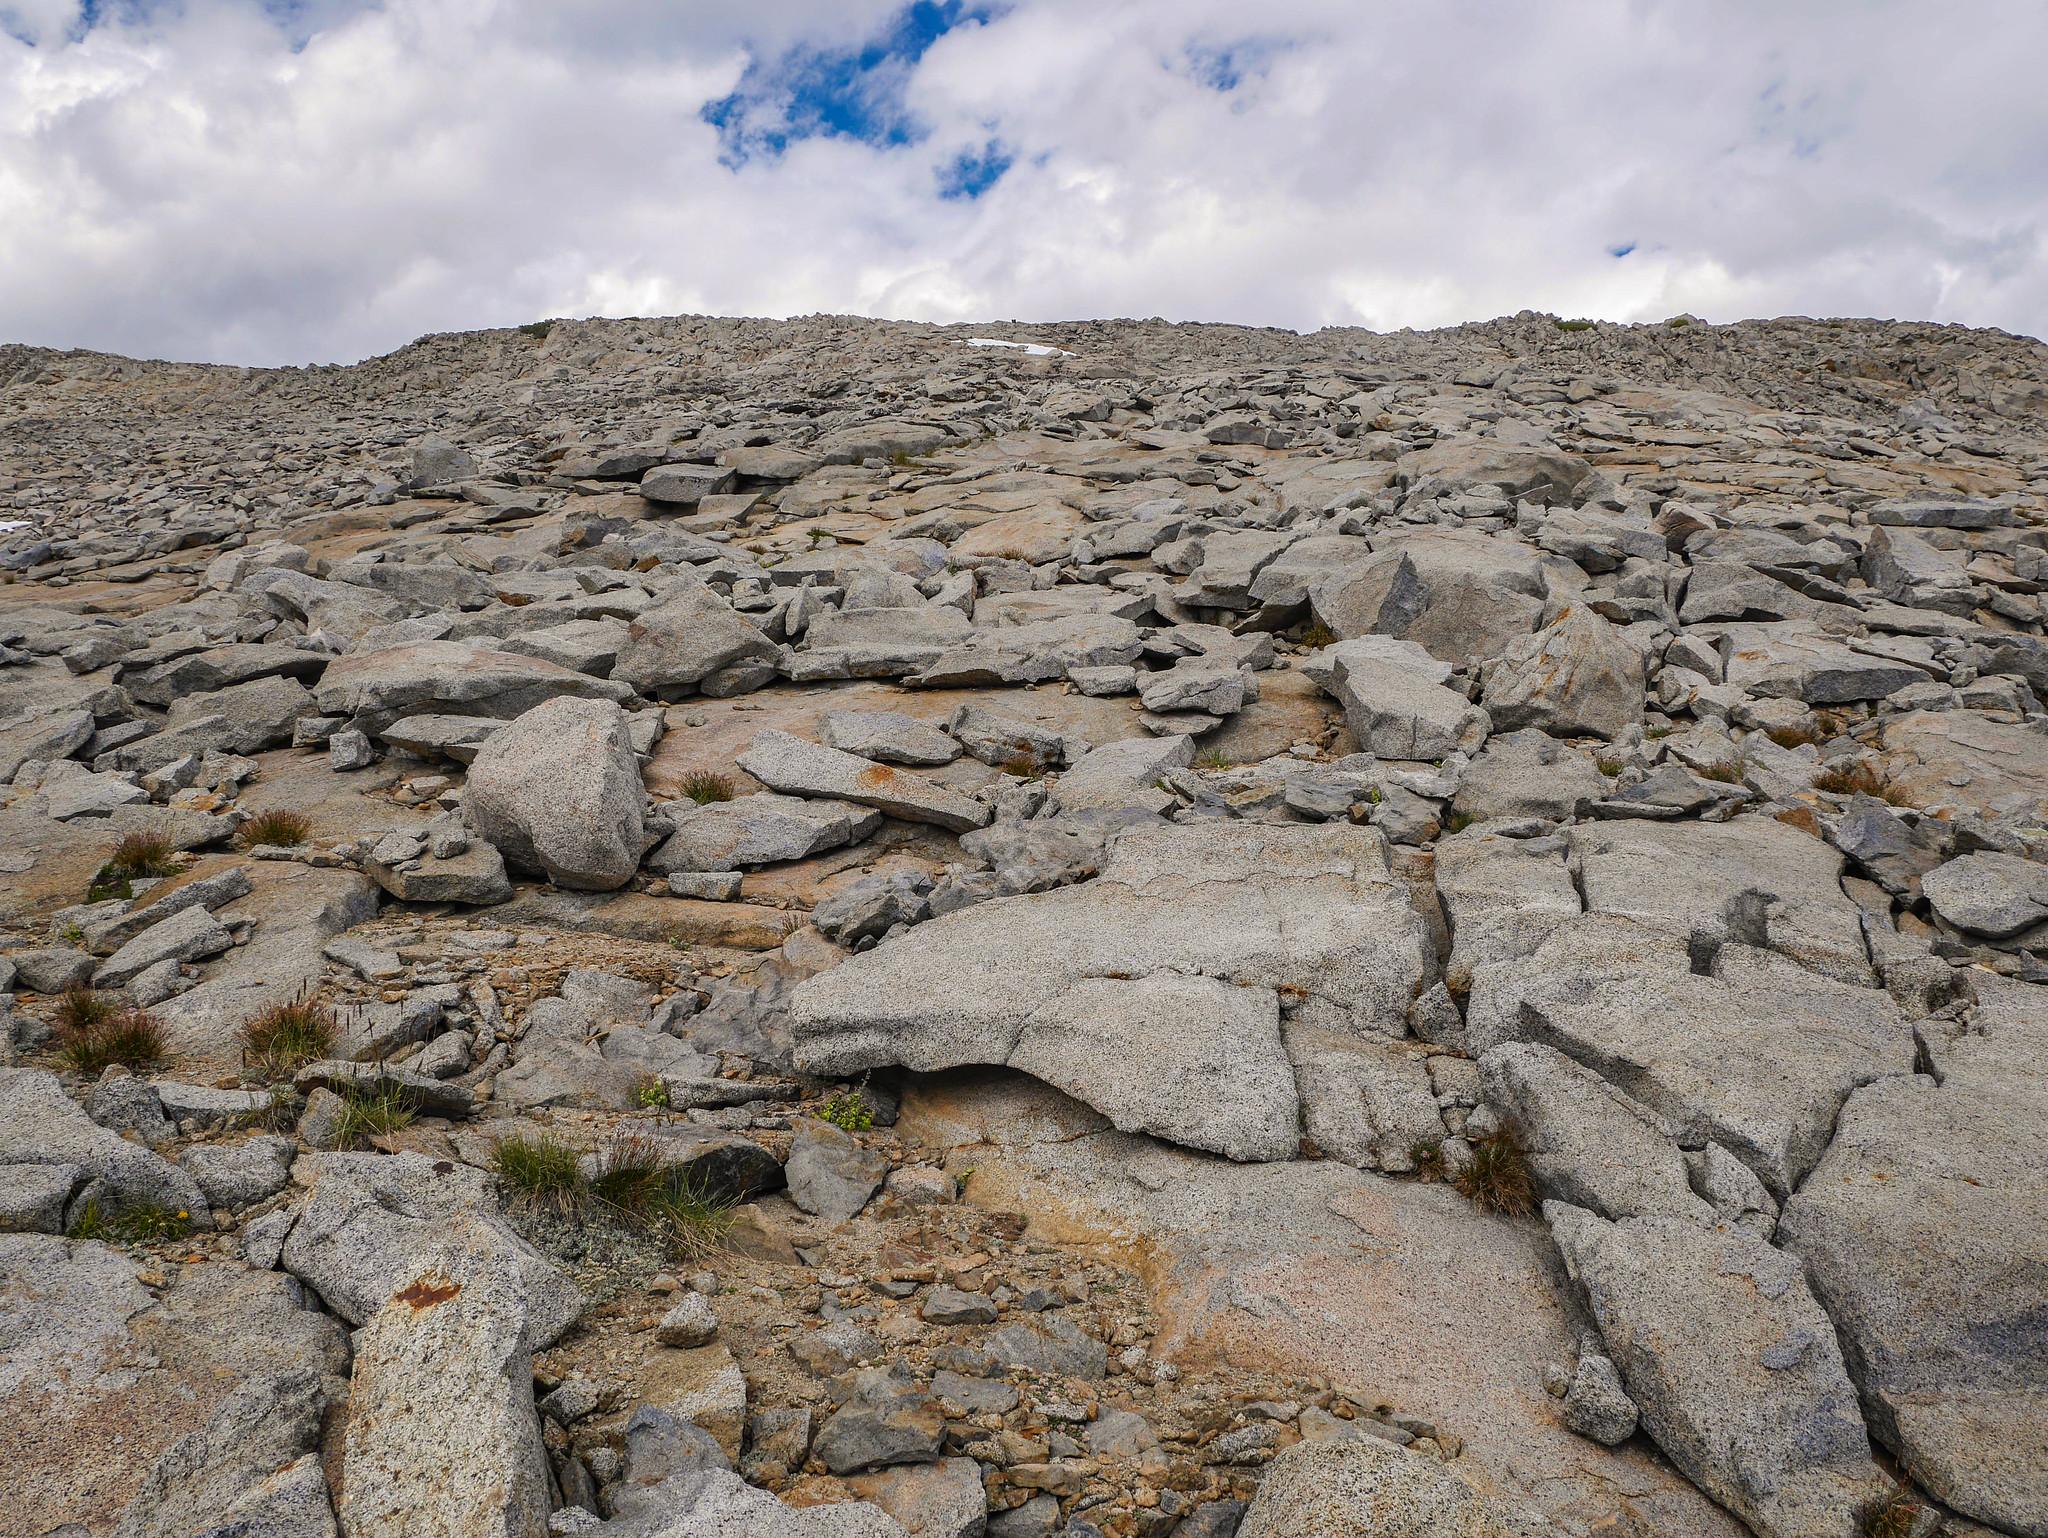 Ascending Amelia Earhardt pass